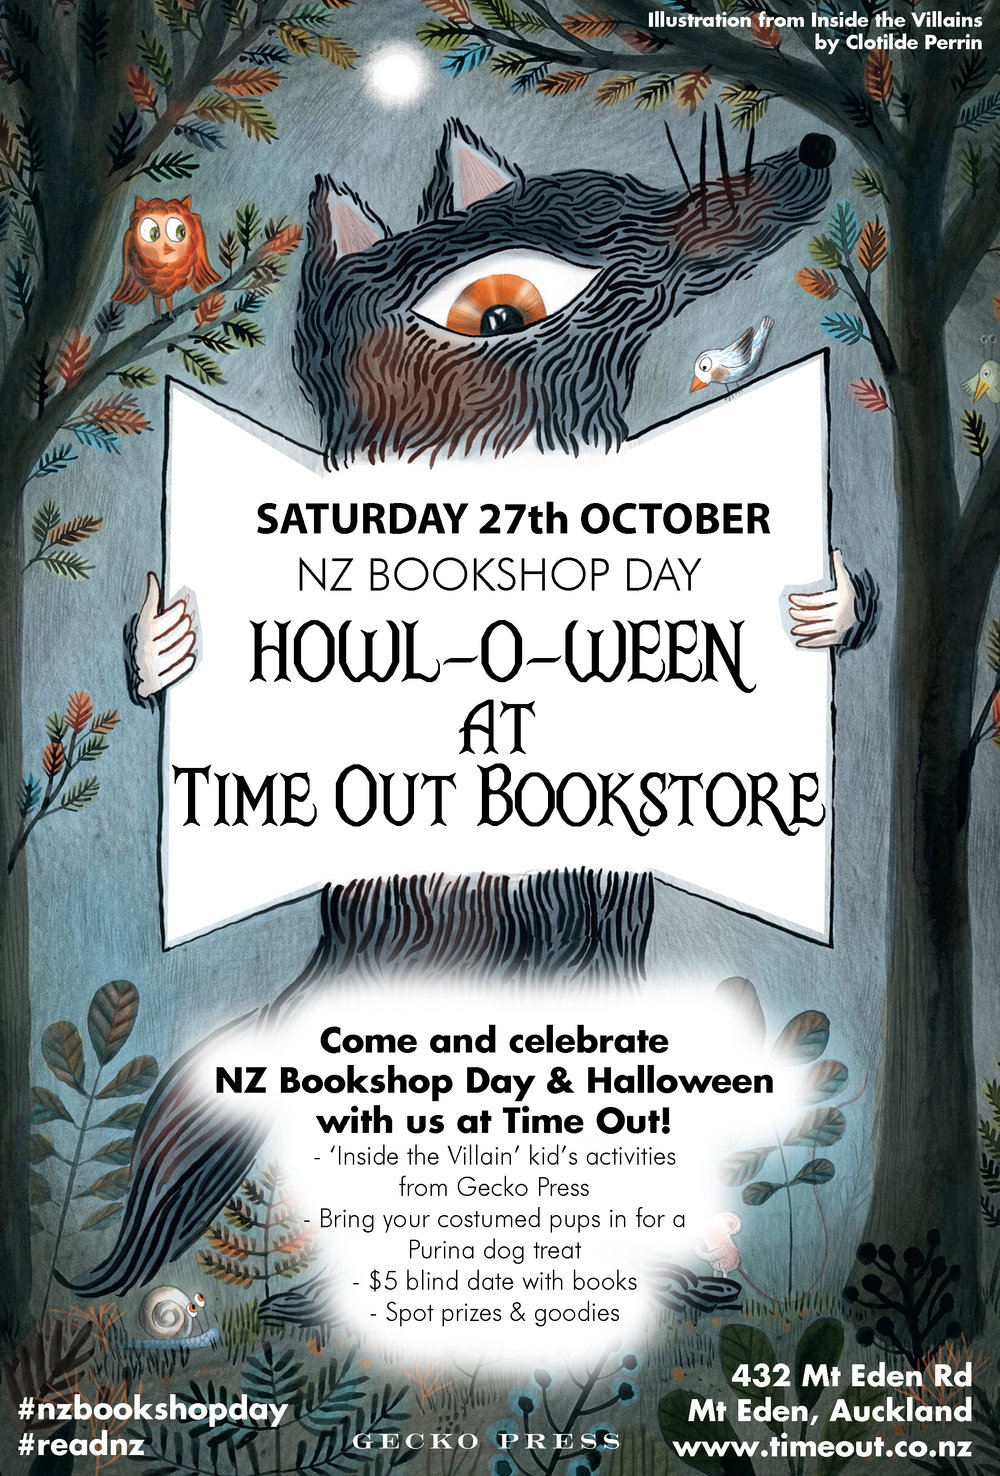 bookshopdayposter2018.jpg